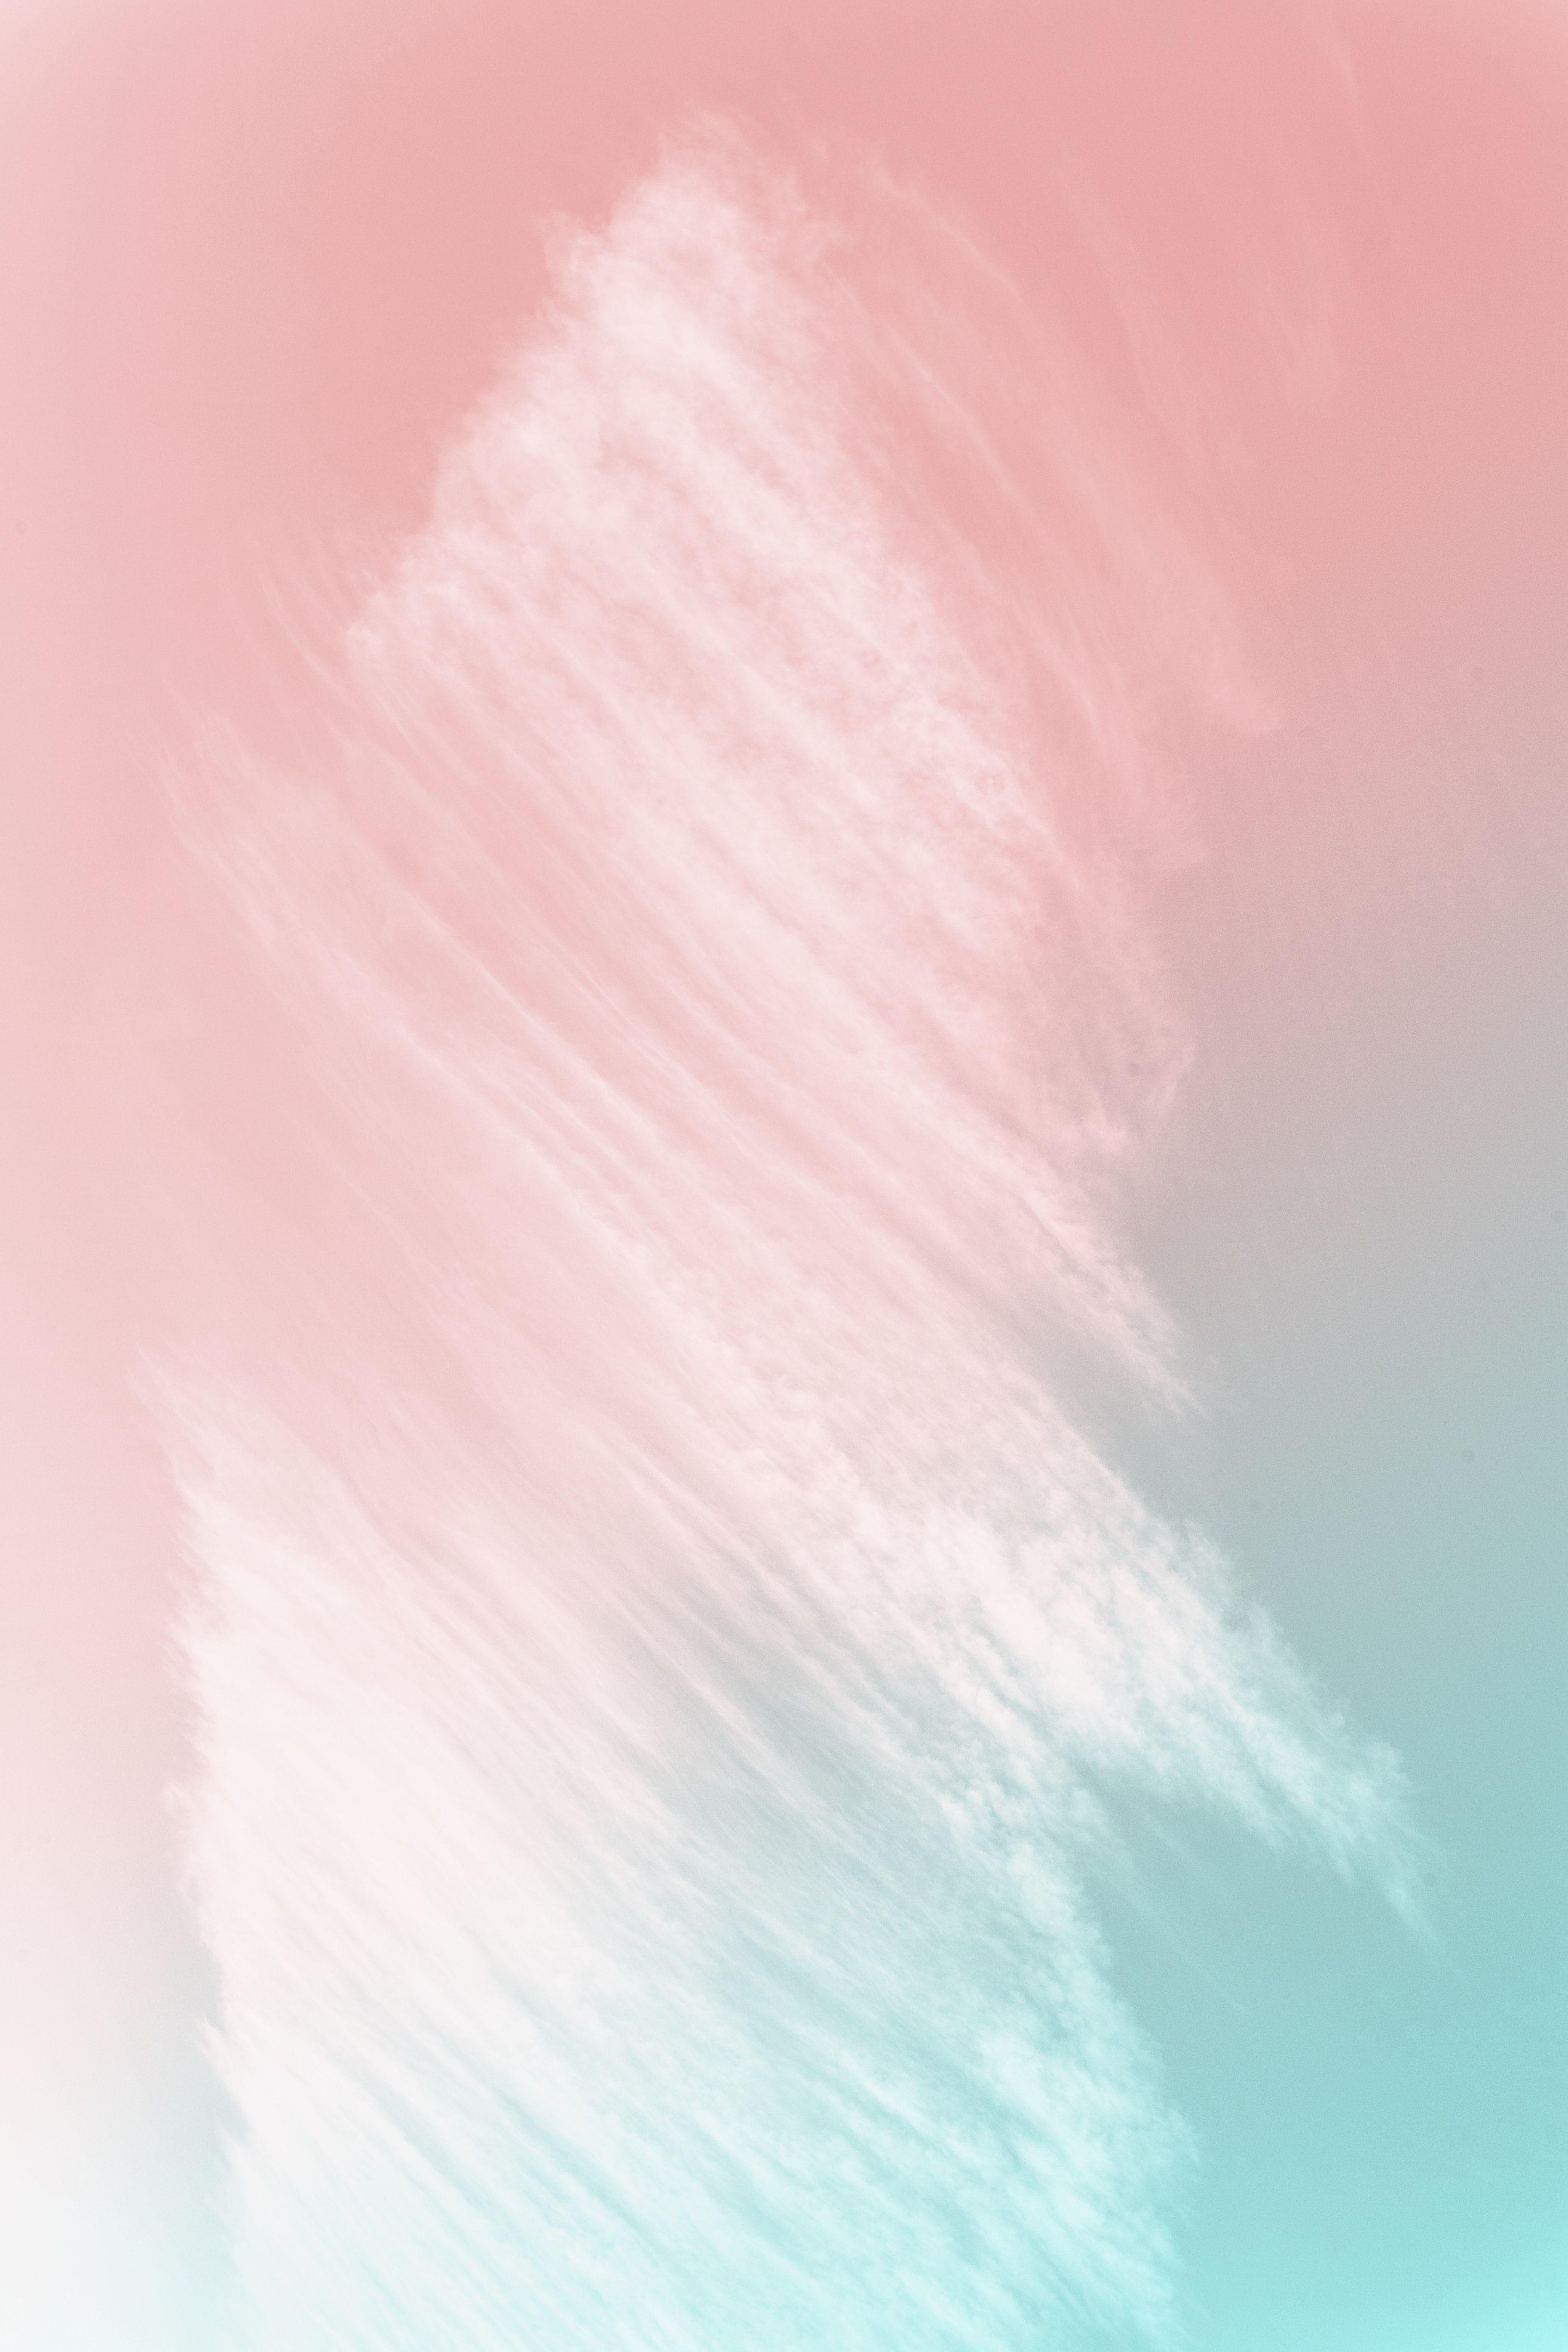 Best 100 Pastel Pictures Download Free Images On Unsplash Pastel Wallpaper Pastel Background Cute Desktop Wallpaper